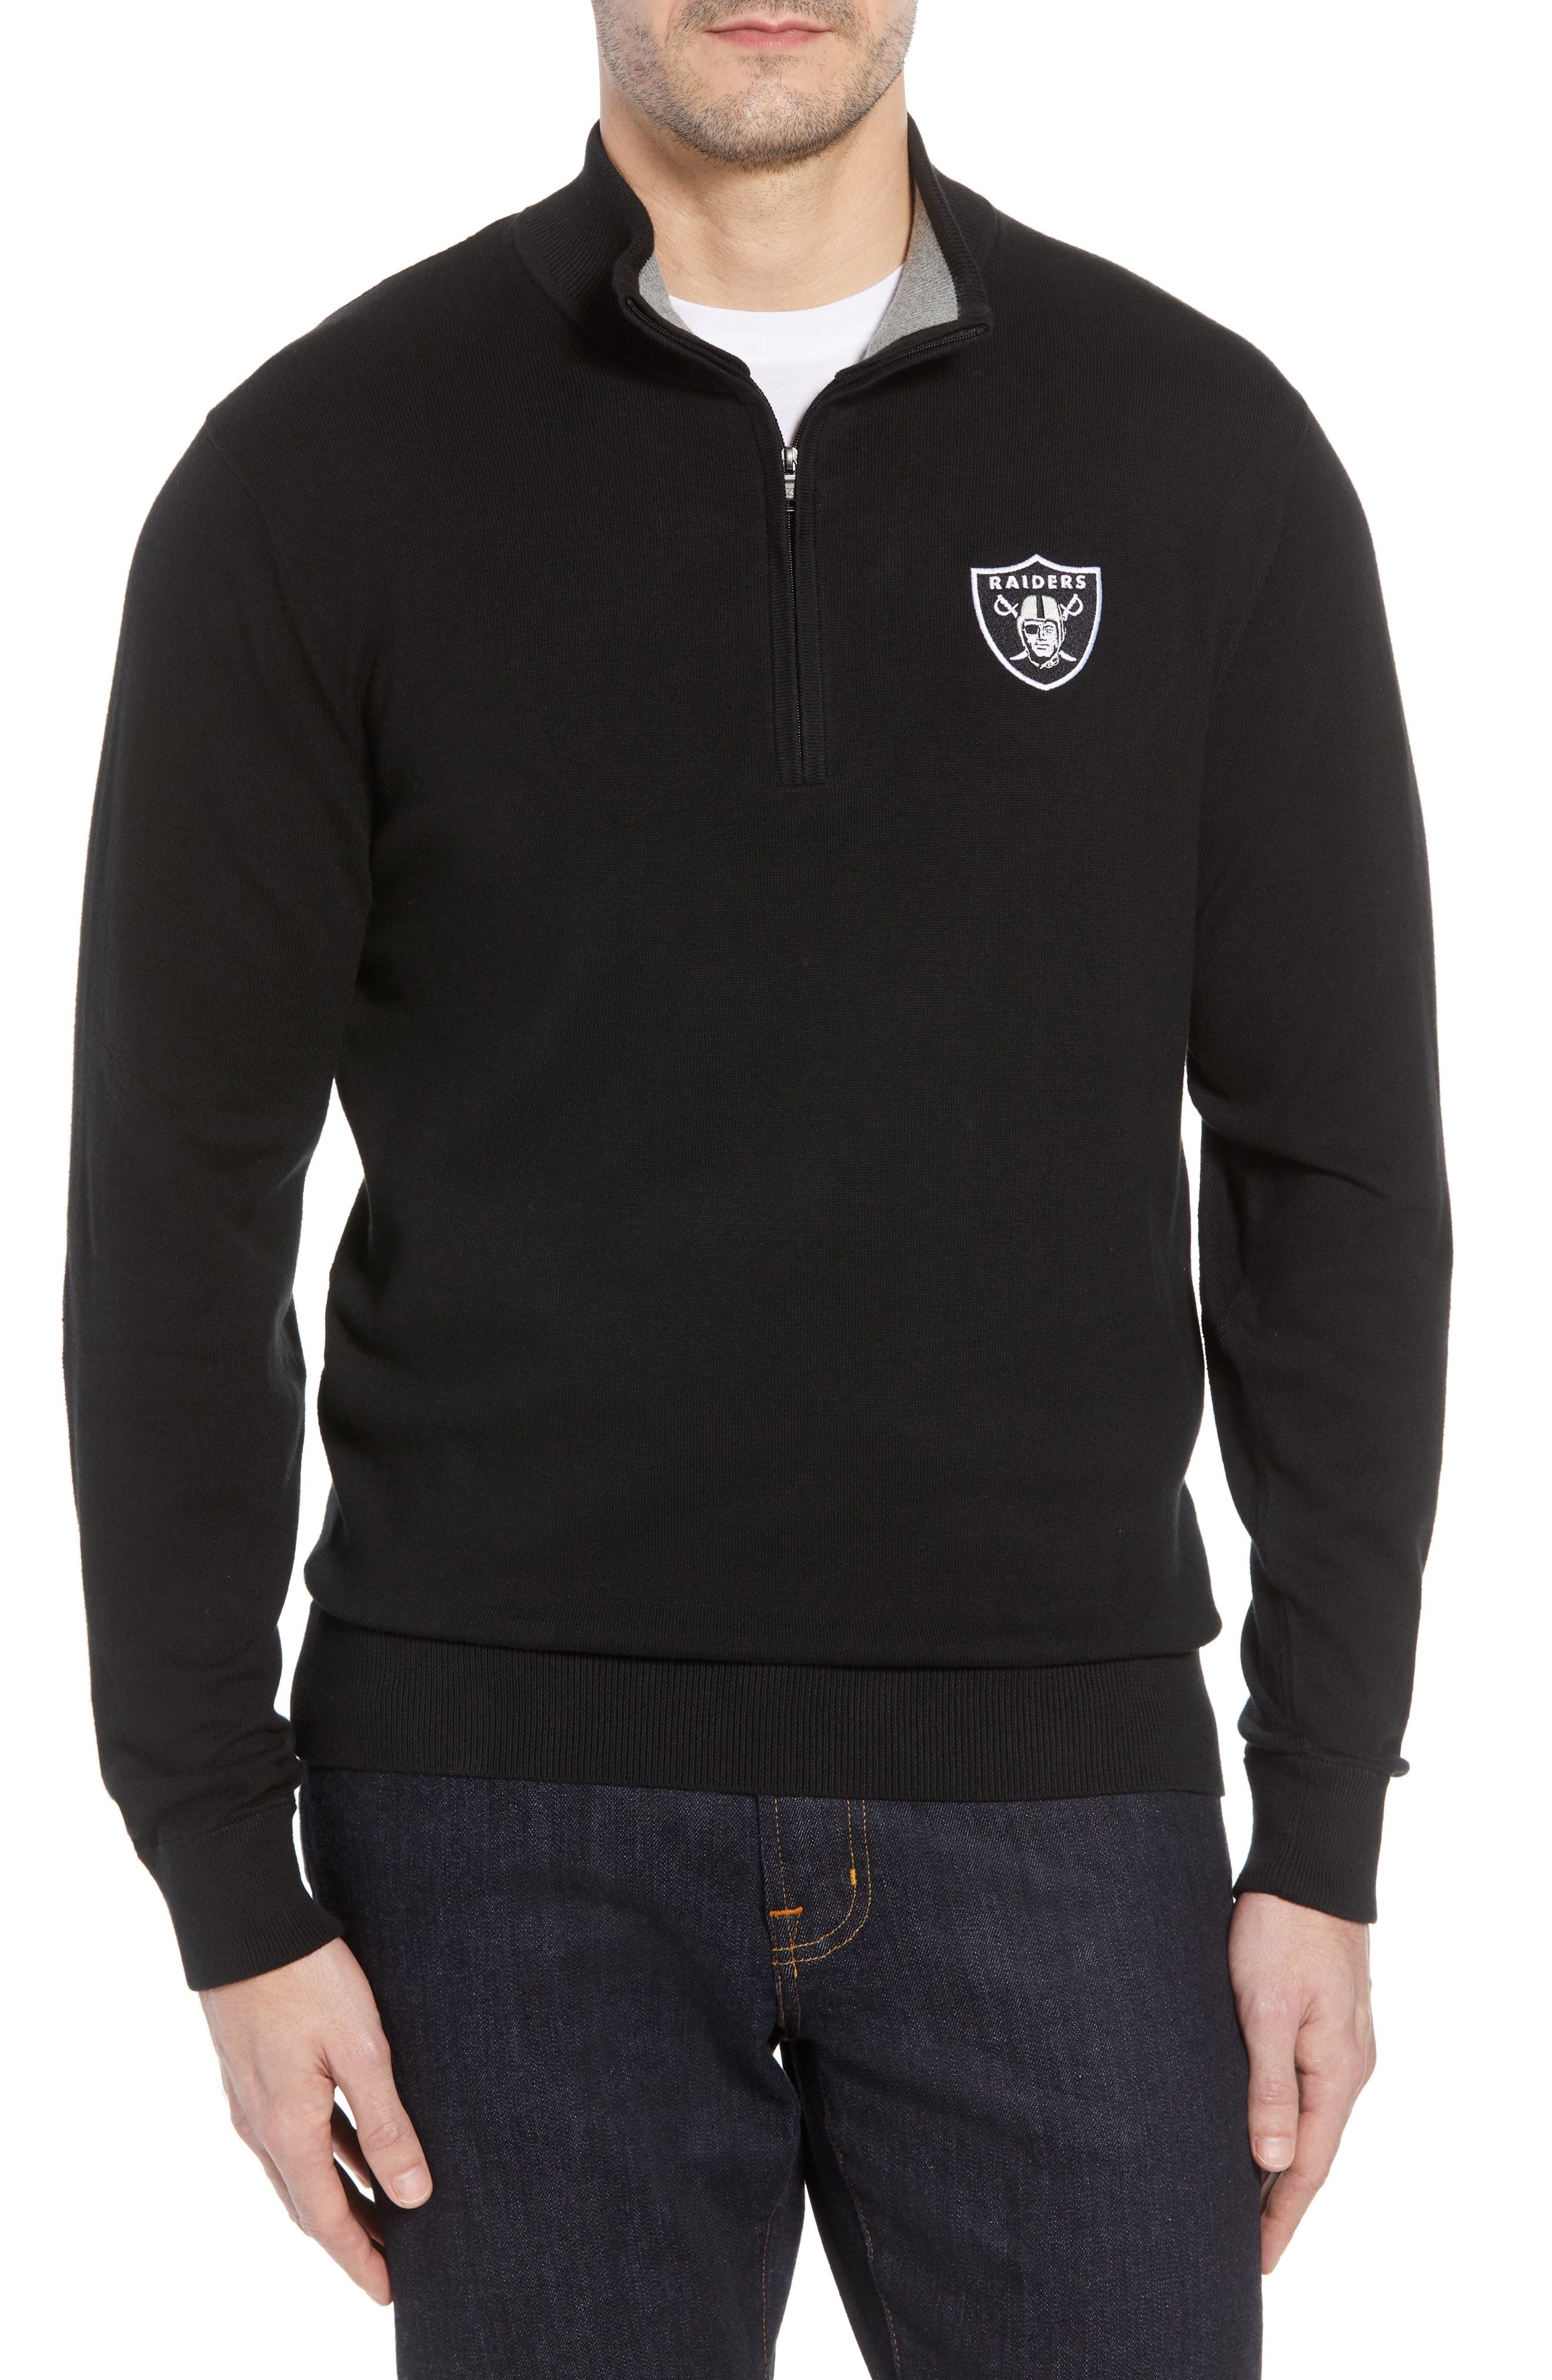 Las Vegas Raiders Lakemont Regular Fit Quarter Zip Sweater